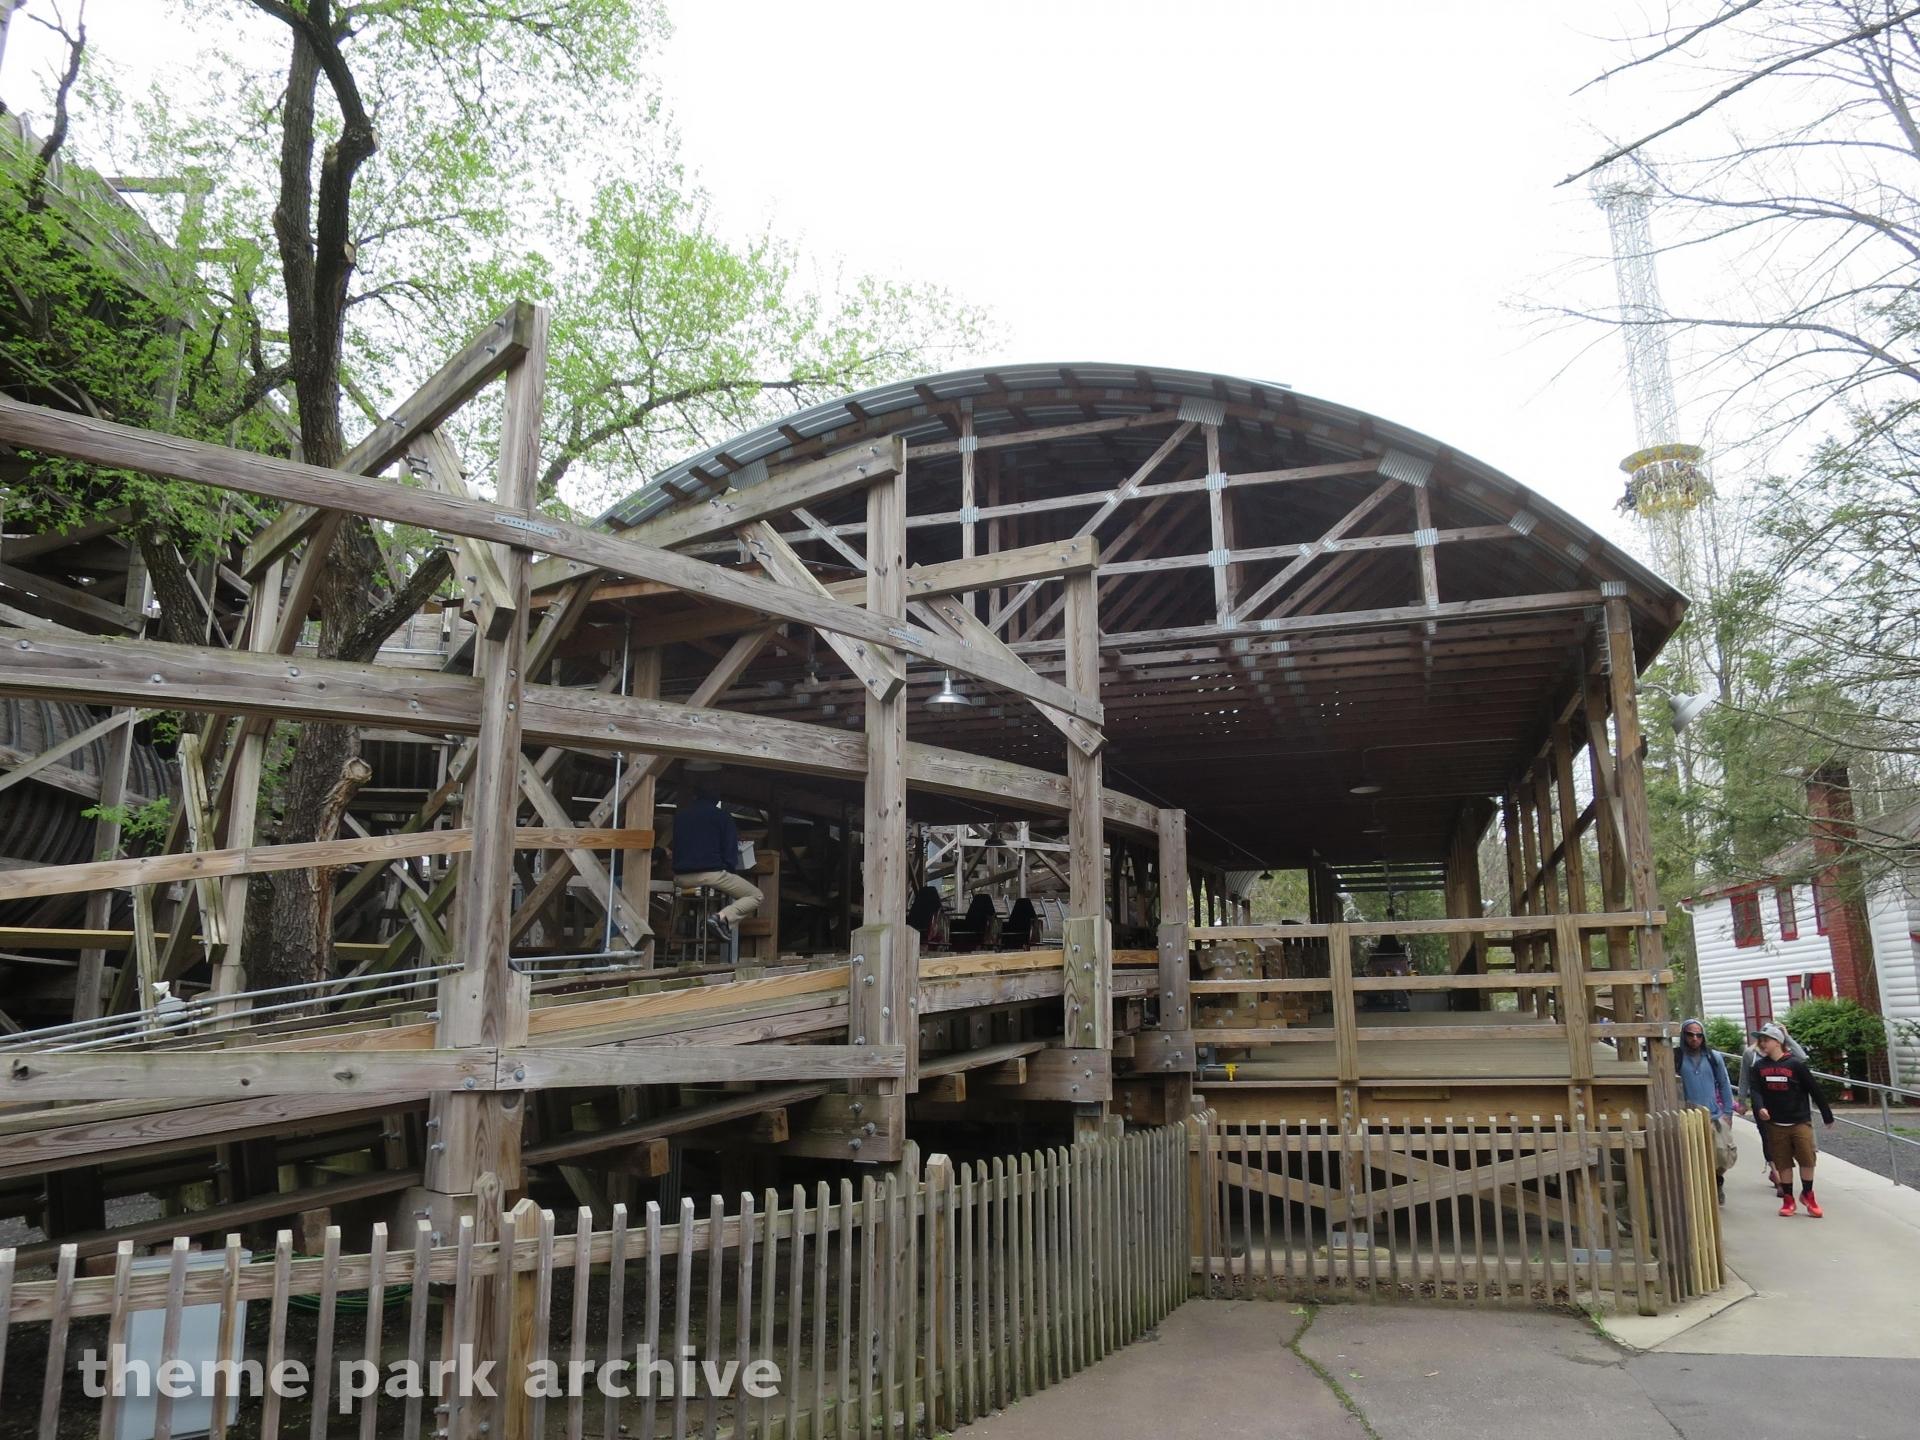 Flying Turns at Knoebels Amusement Resort